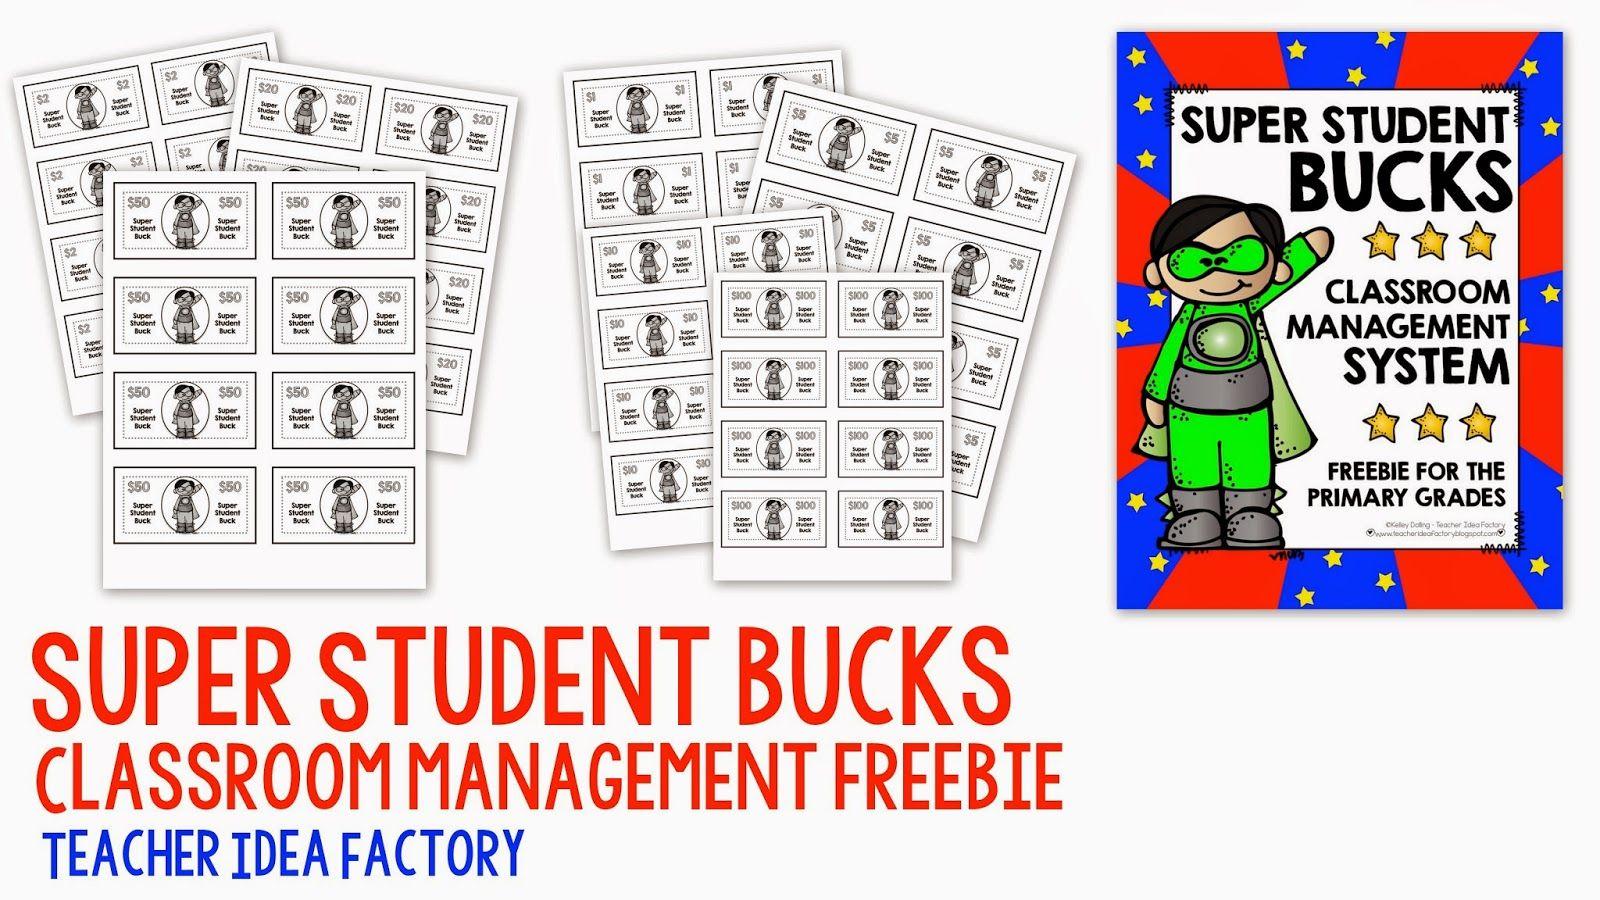 SUPER STUDENT BUCKS CLASSROOM MANAGEMENT FREEBIE